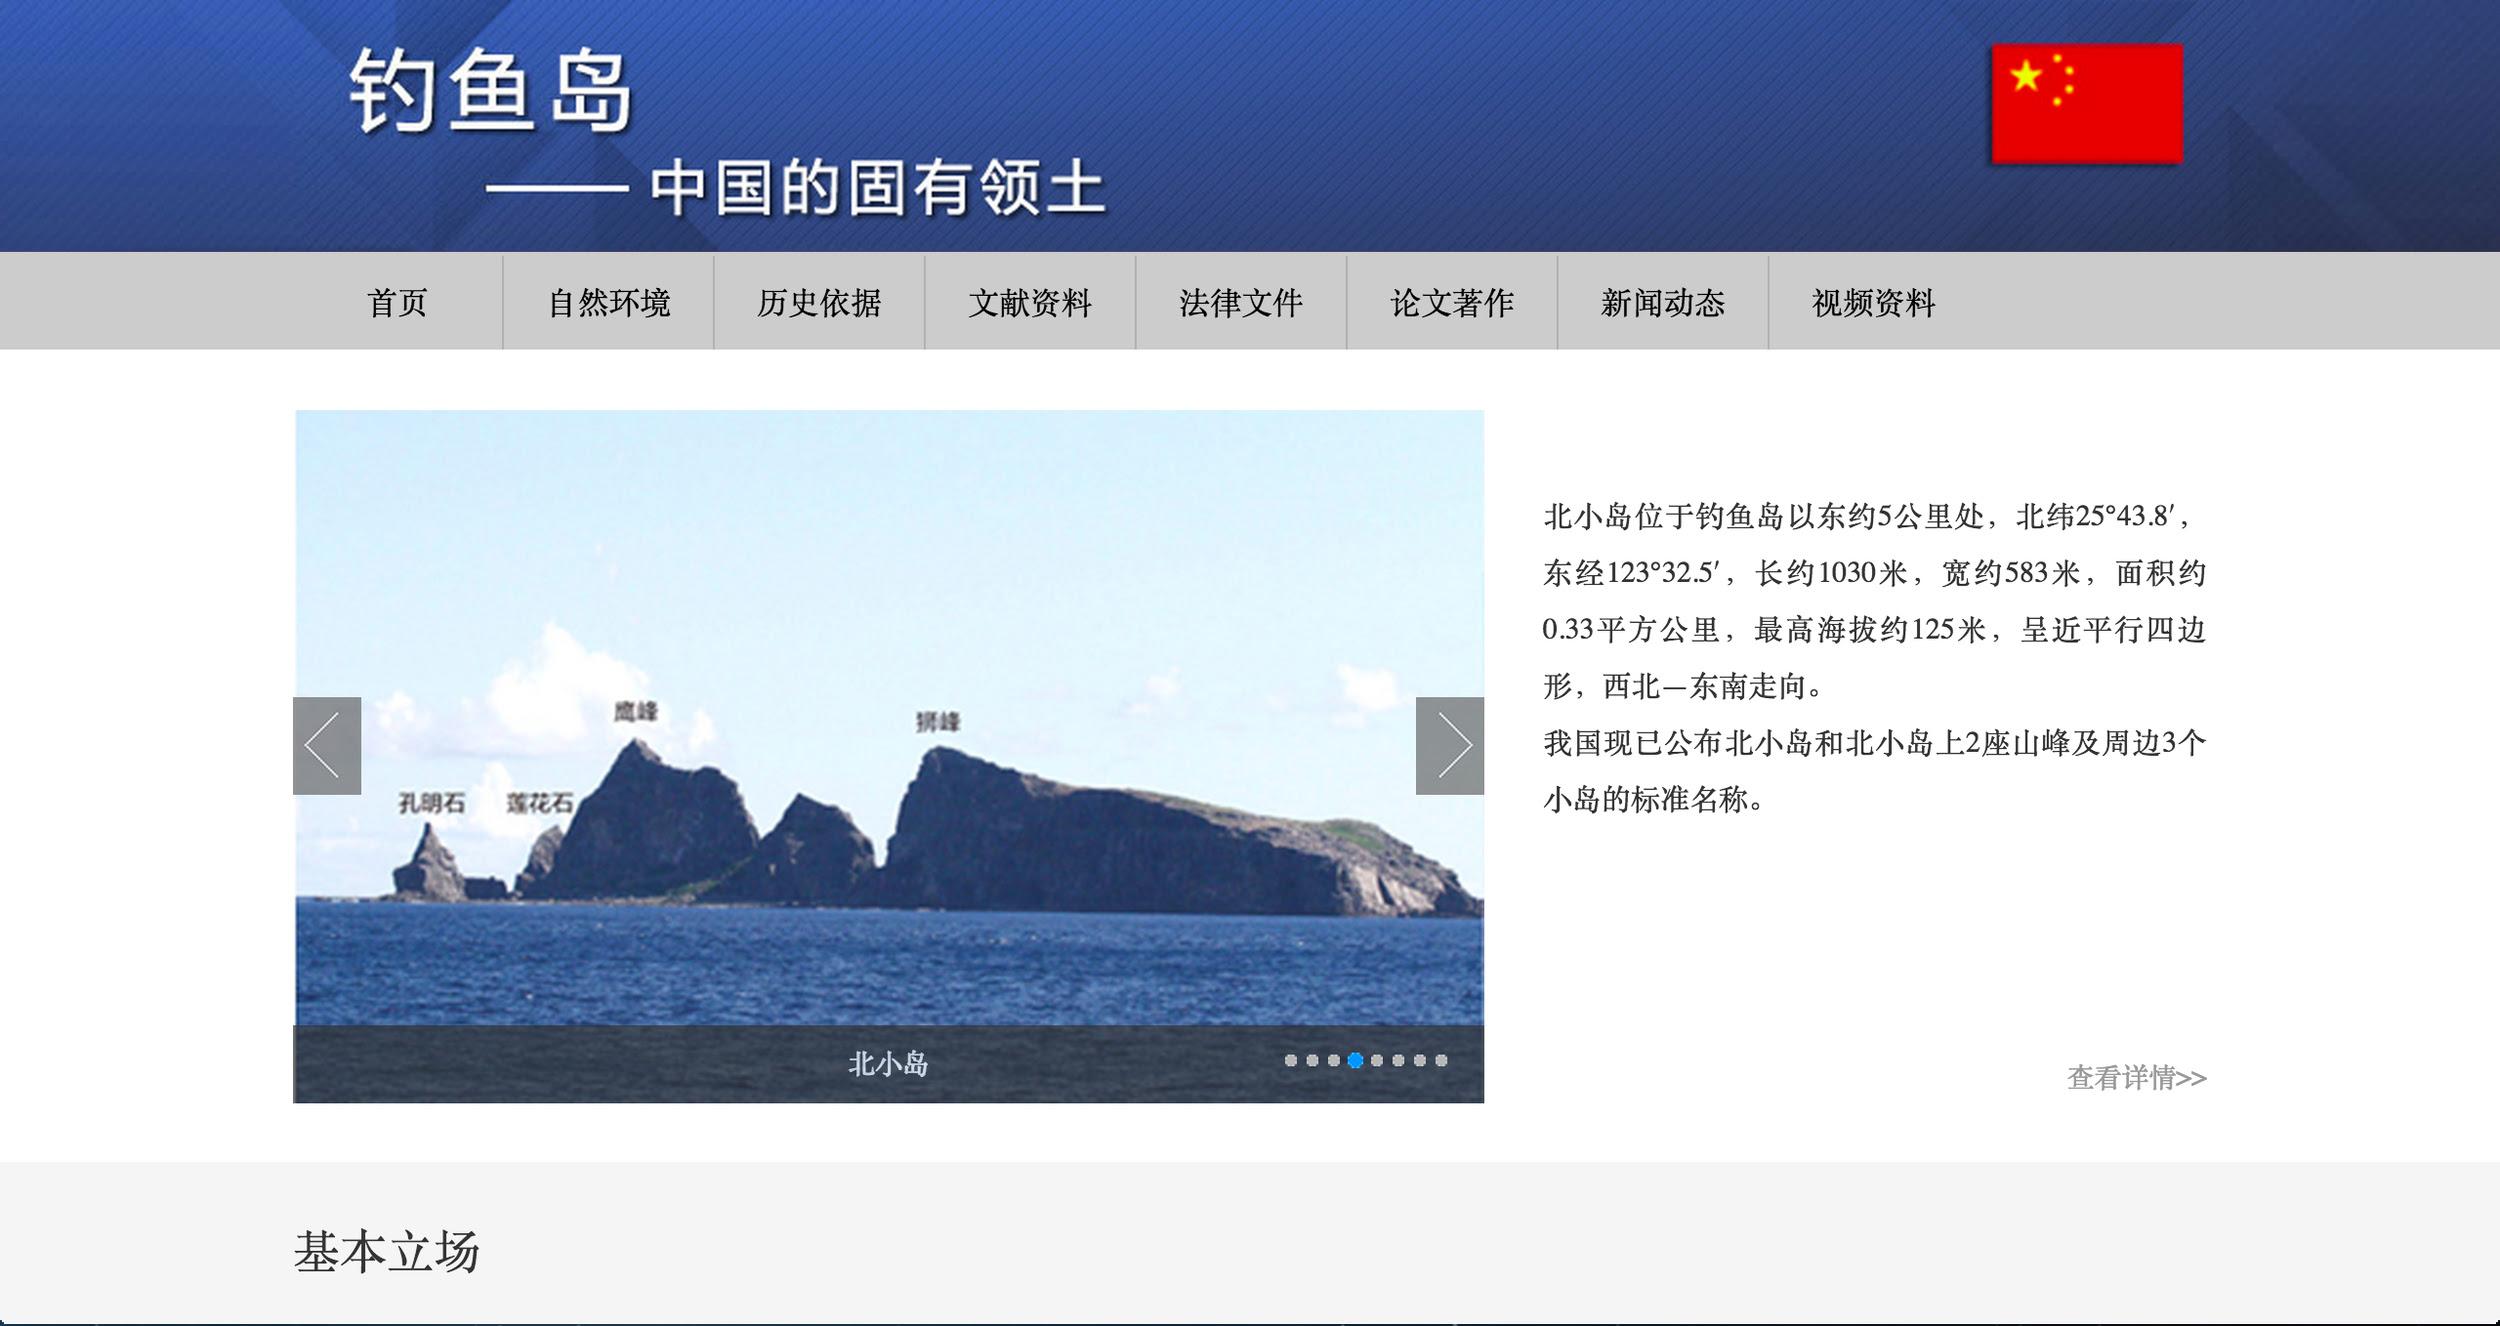 The homepage of www.diaoyudao.org.cn